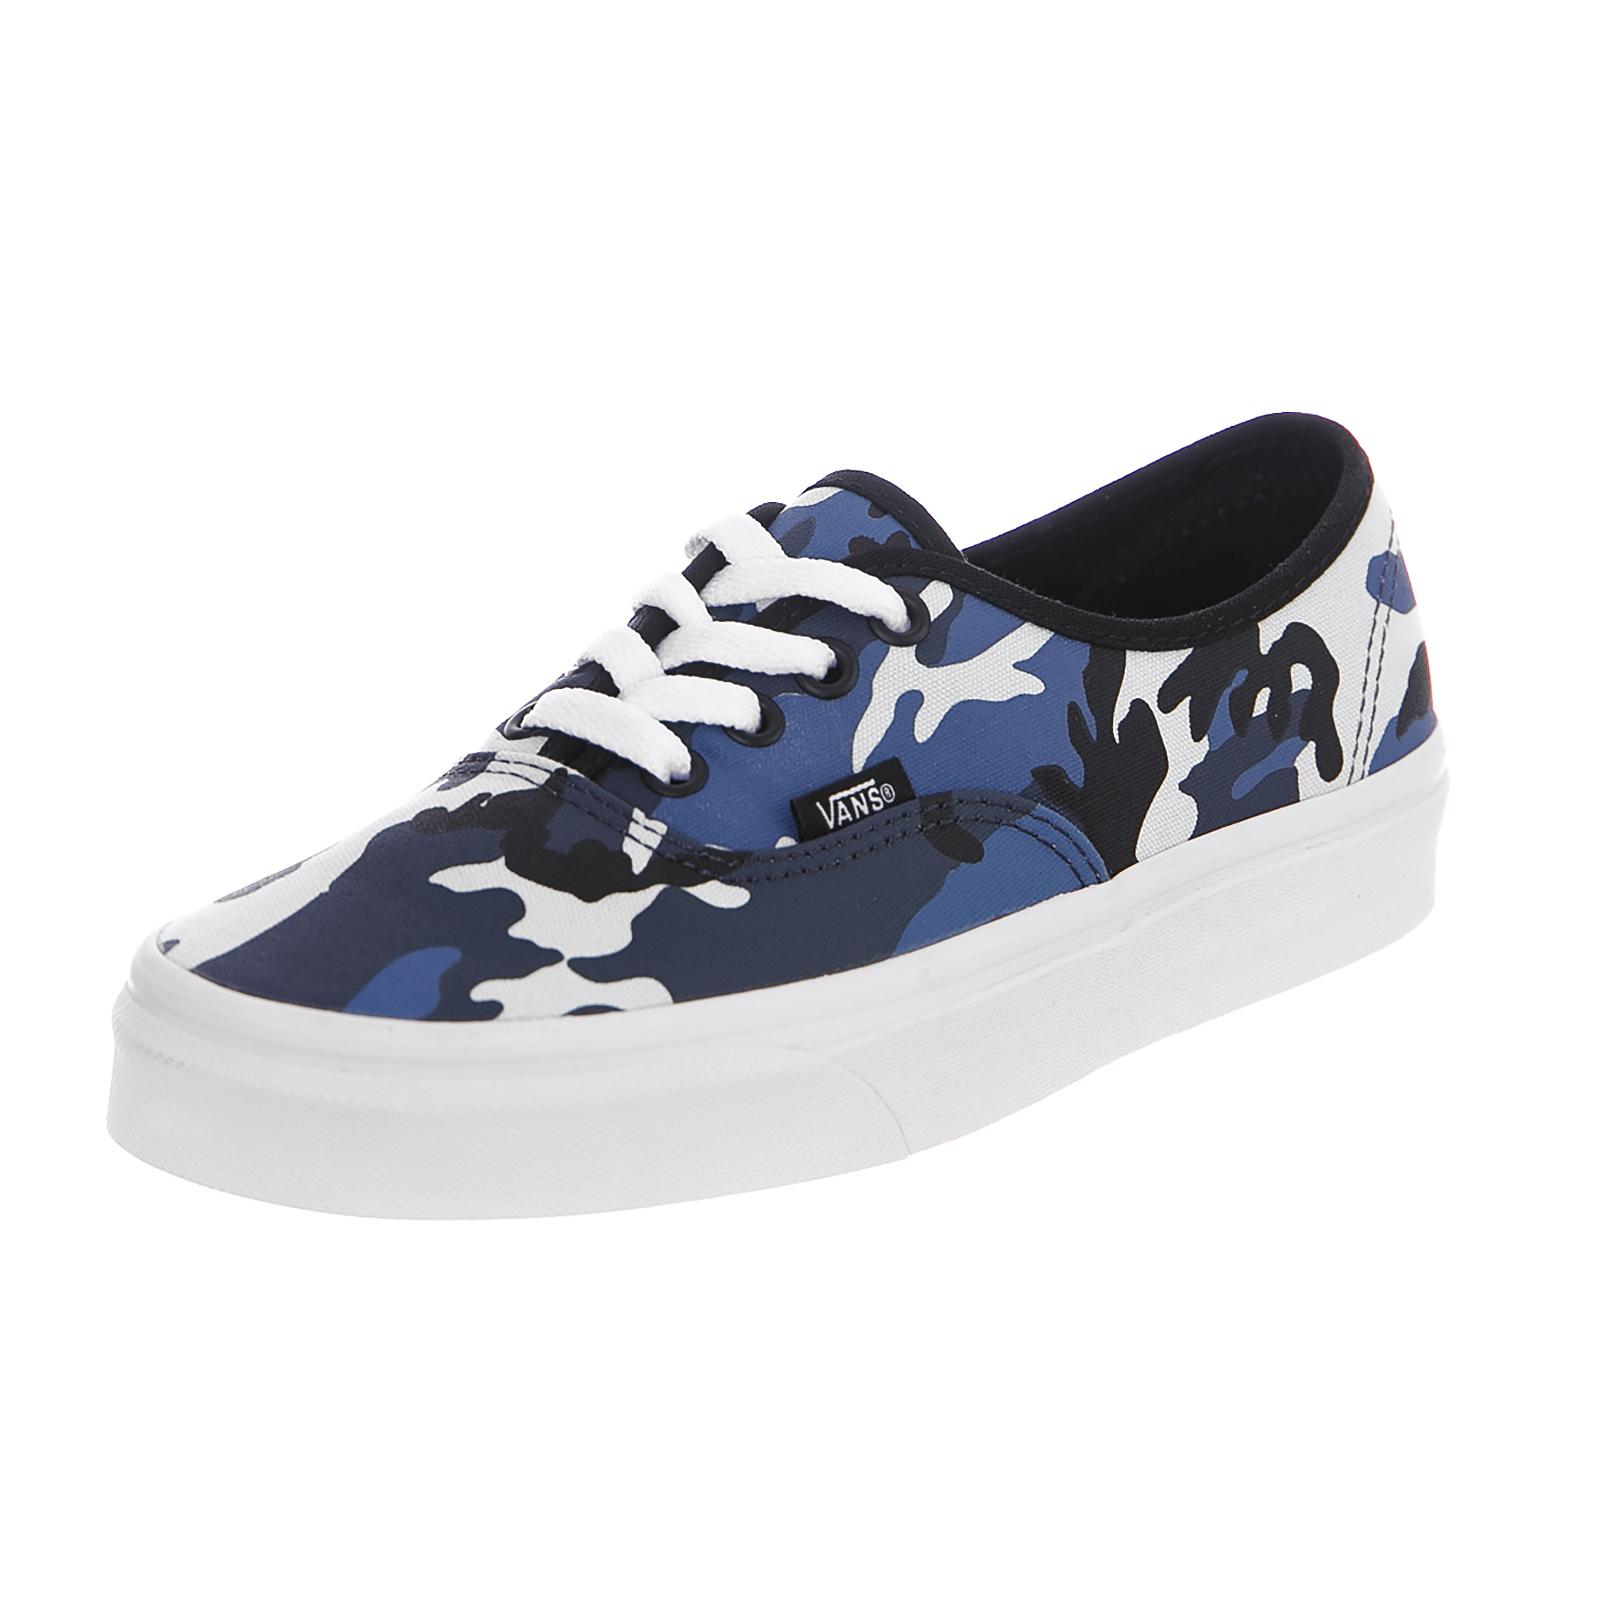 9f318c5844cd9b Vans Sneakers U Authentic (Pop Camo) Black Dress Blues True White Nero